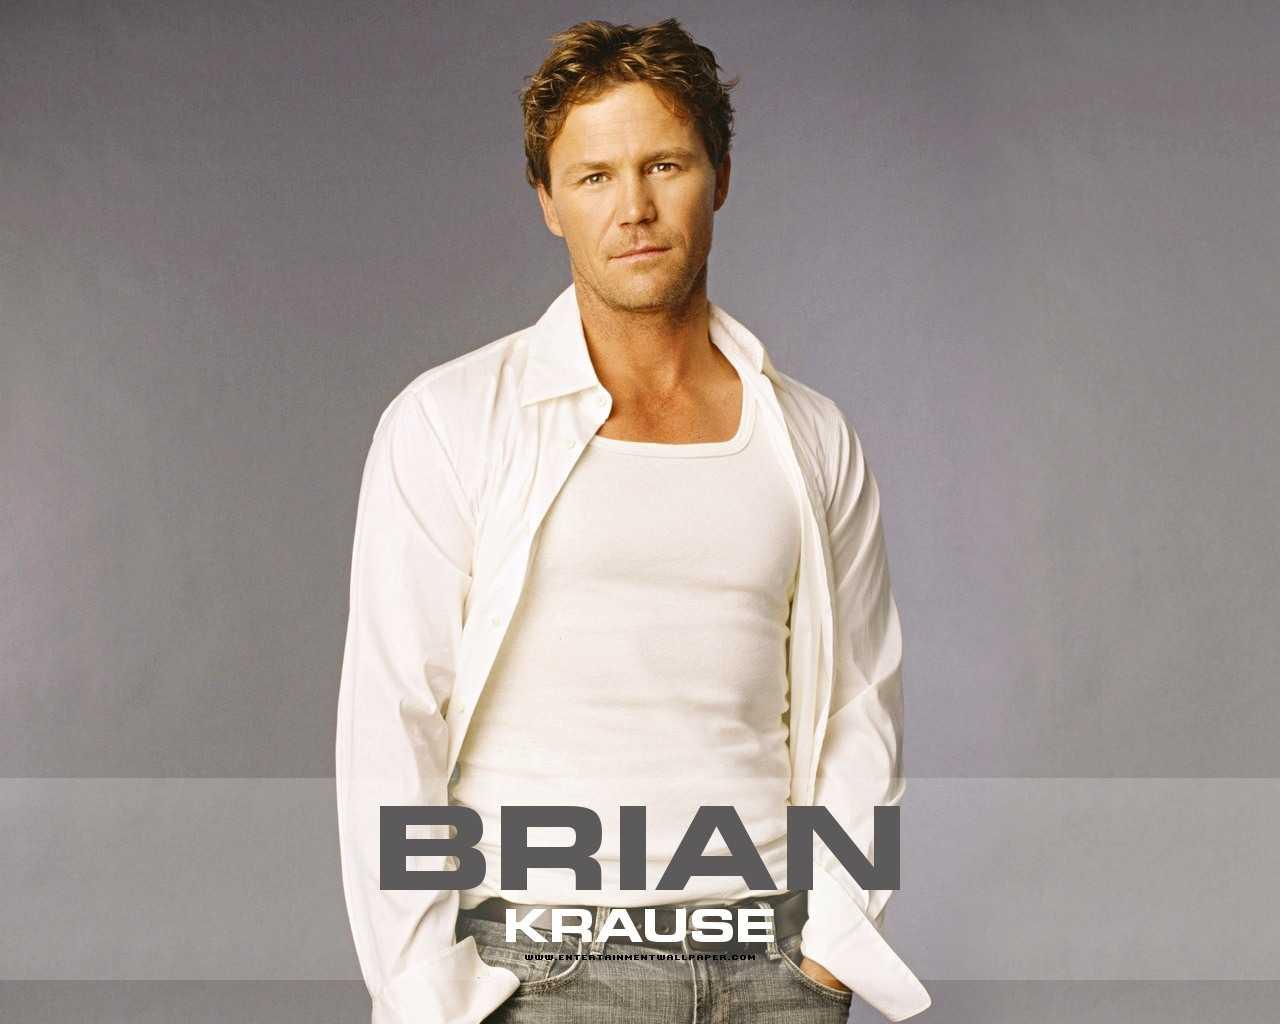 Brian Krause